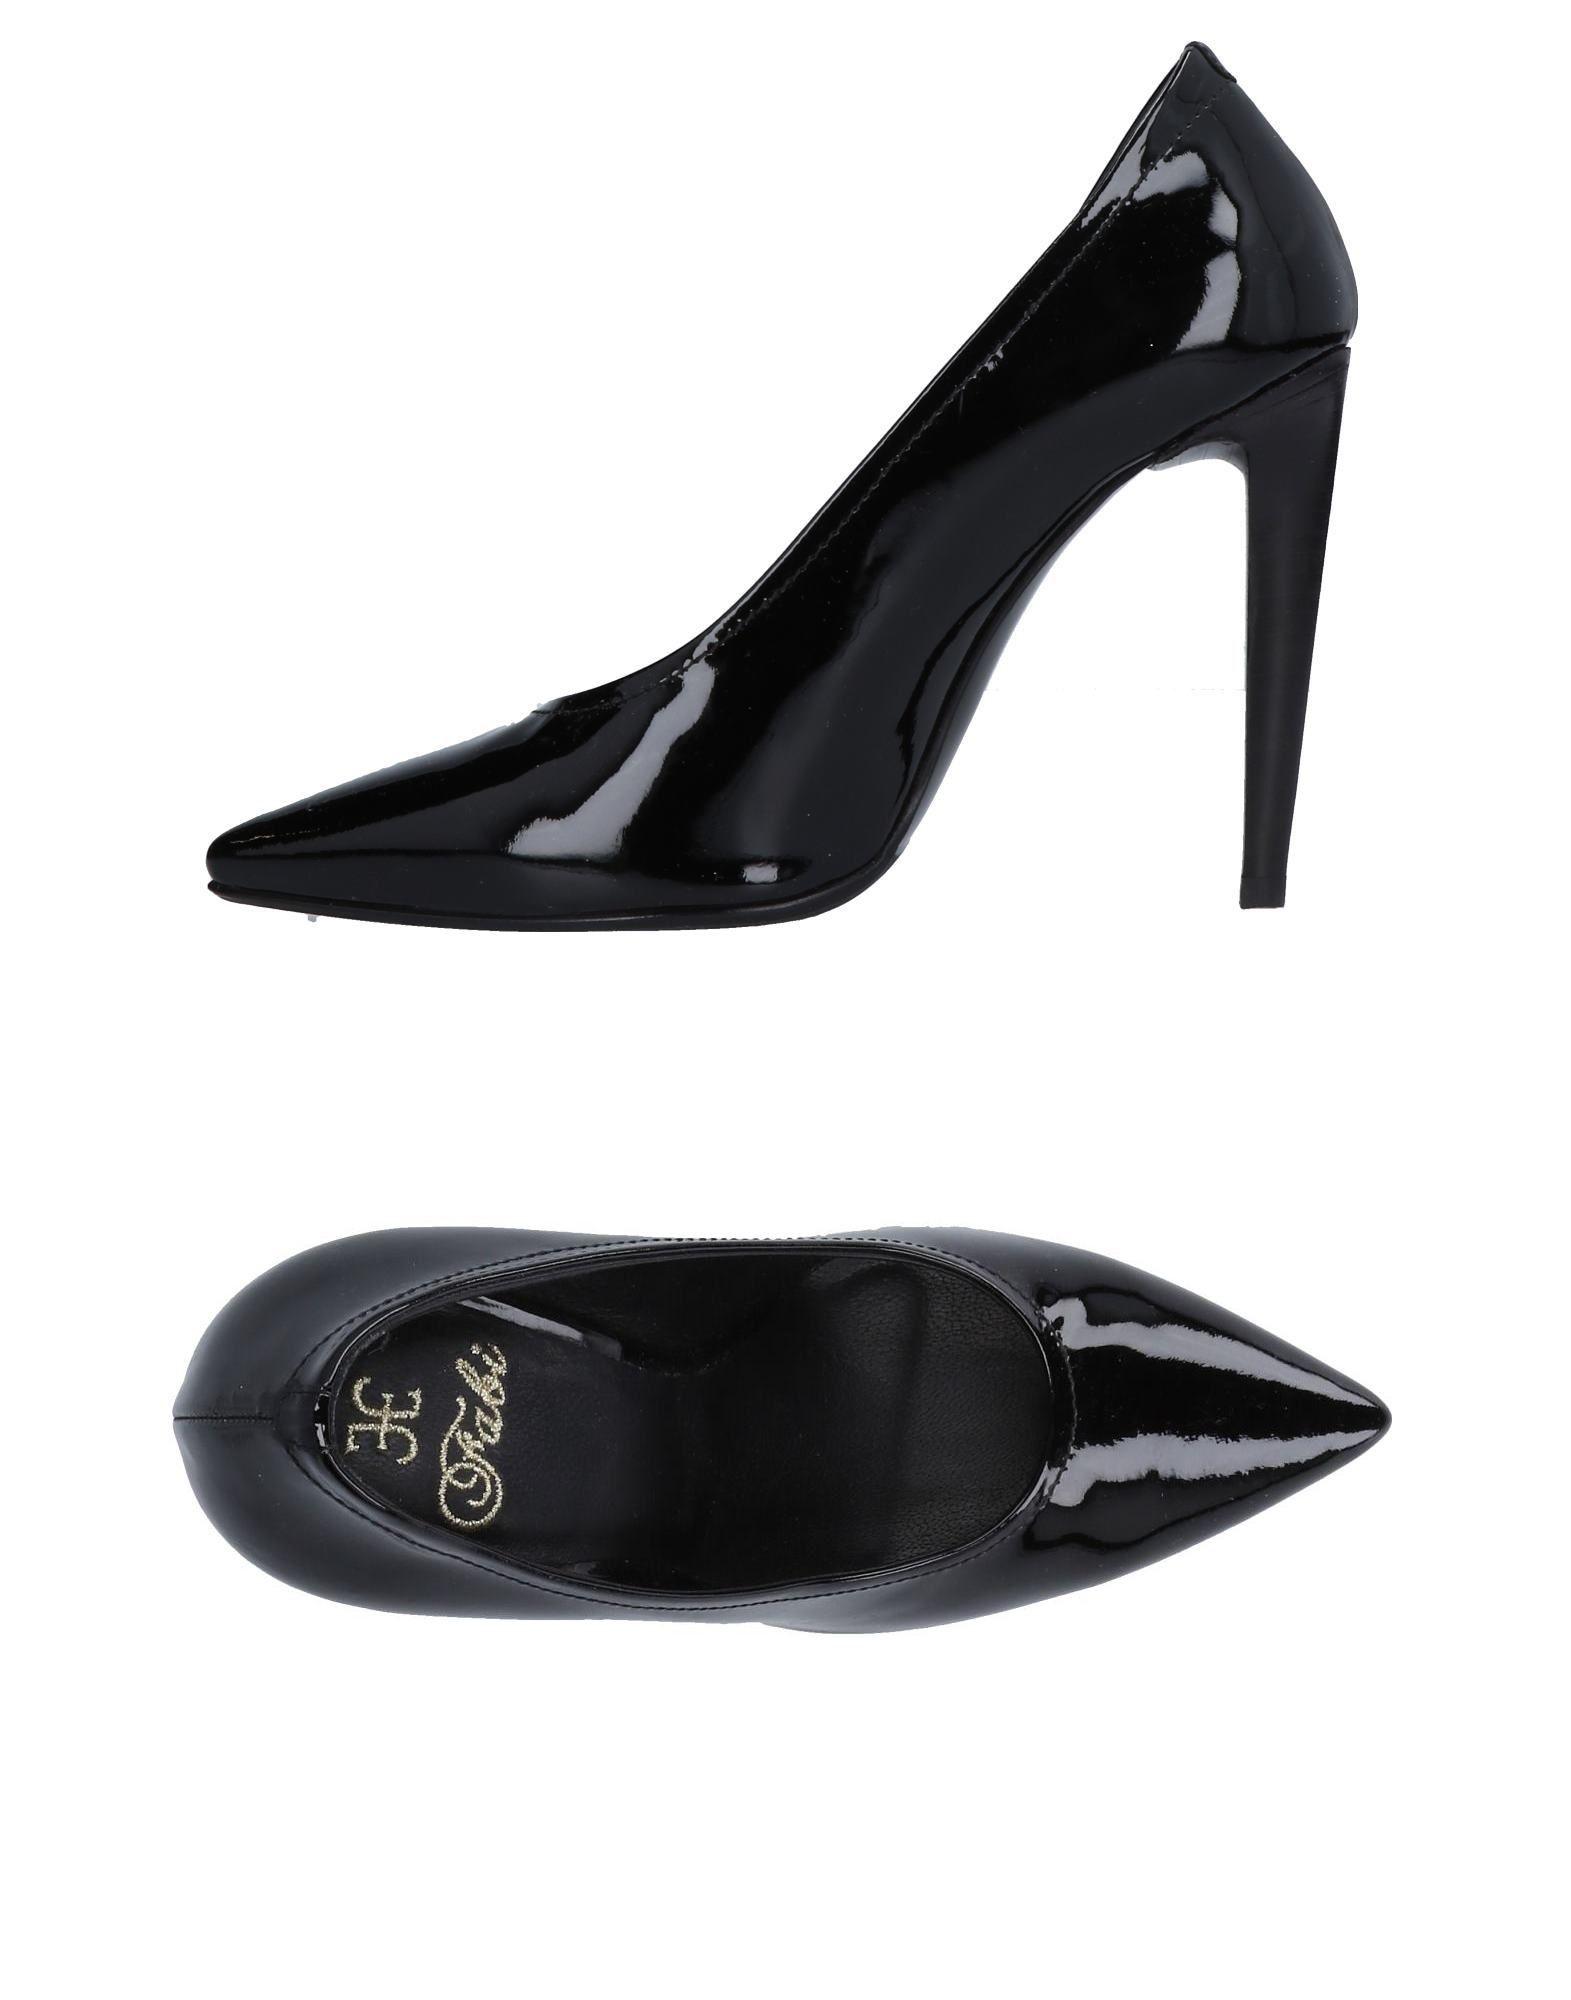 Stilvolle billige Schuhe Damen Fabi Pumps Damen Schuhe  11504278HF e2f326